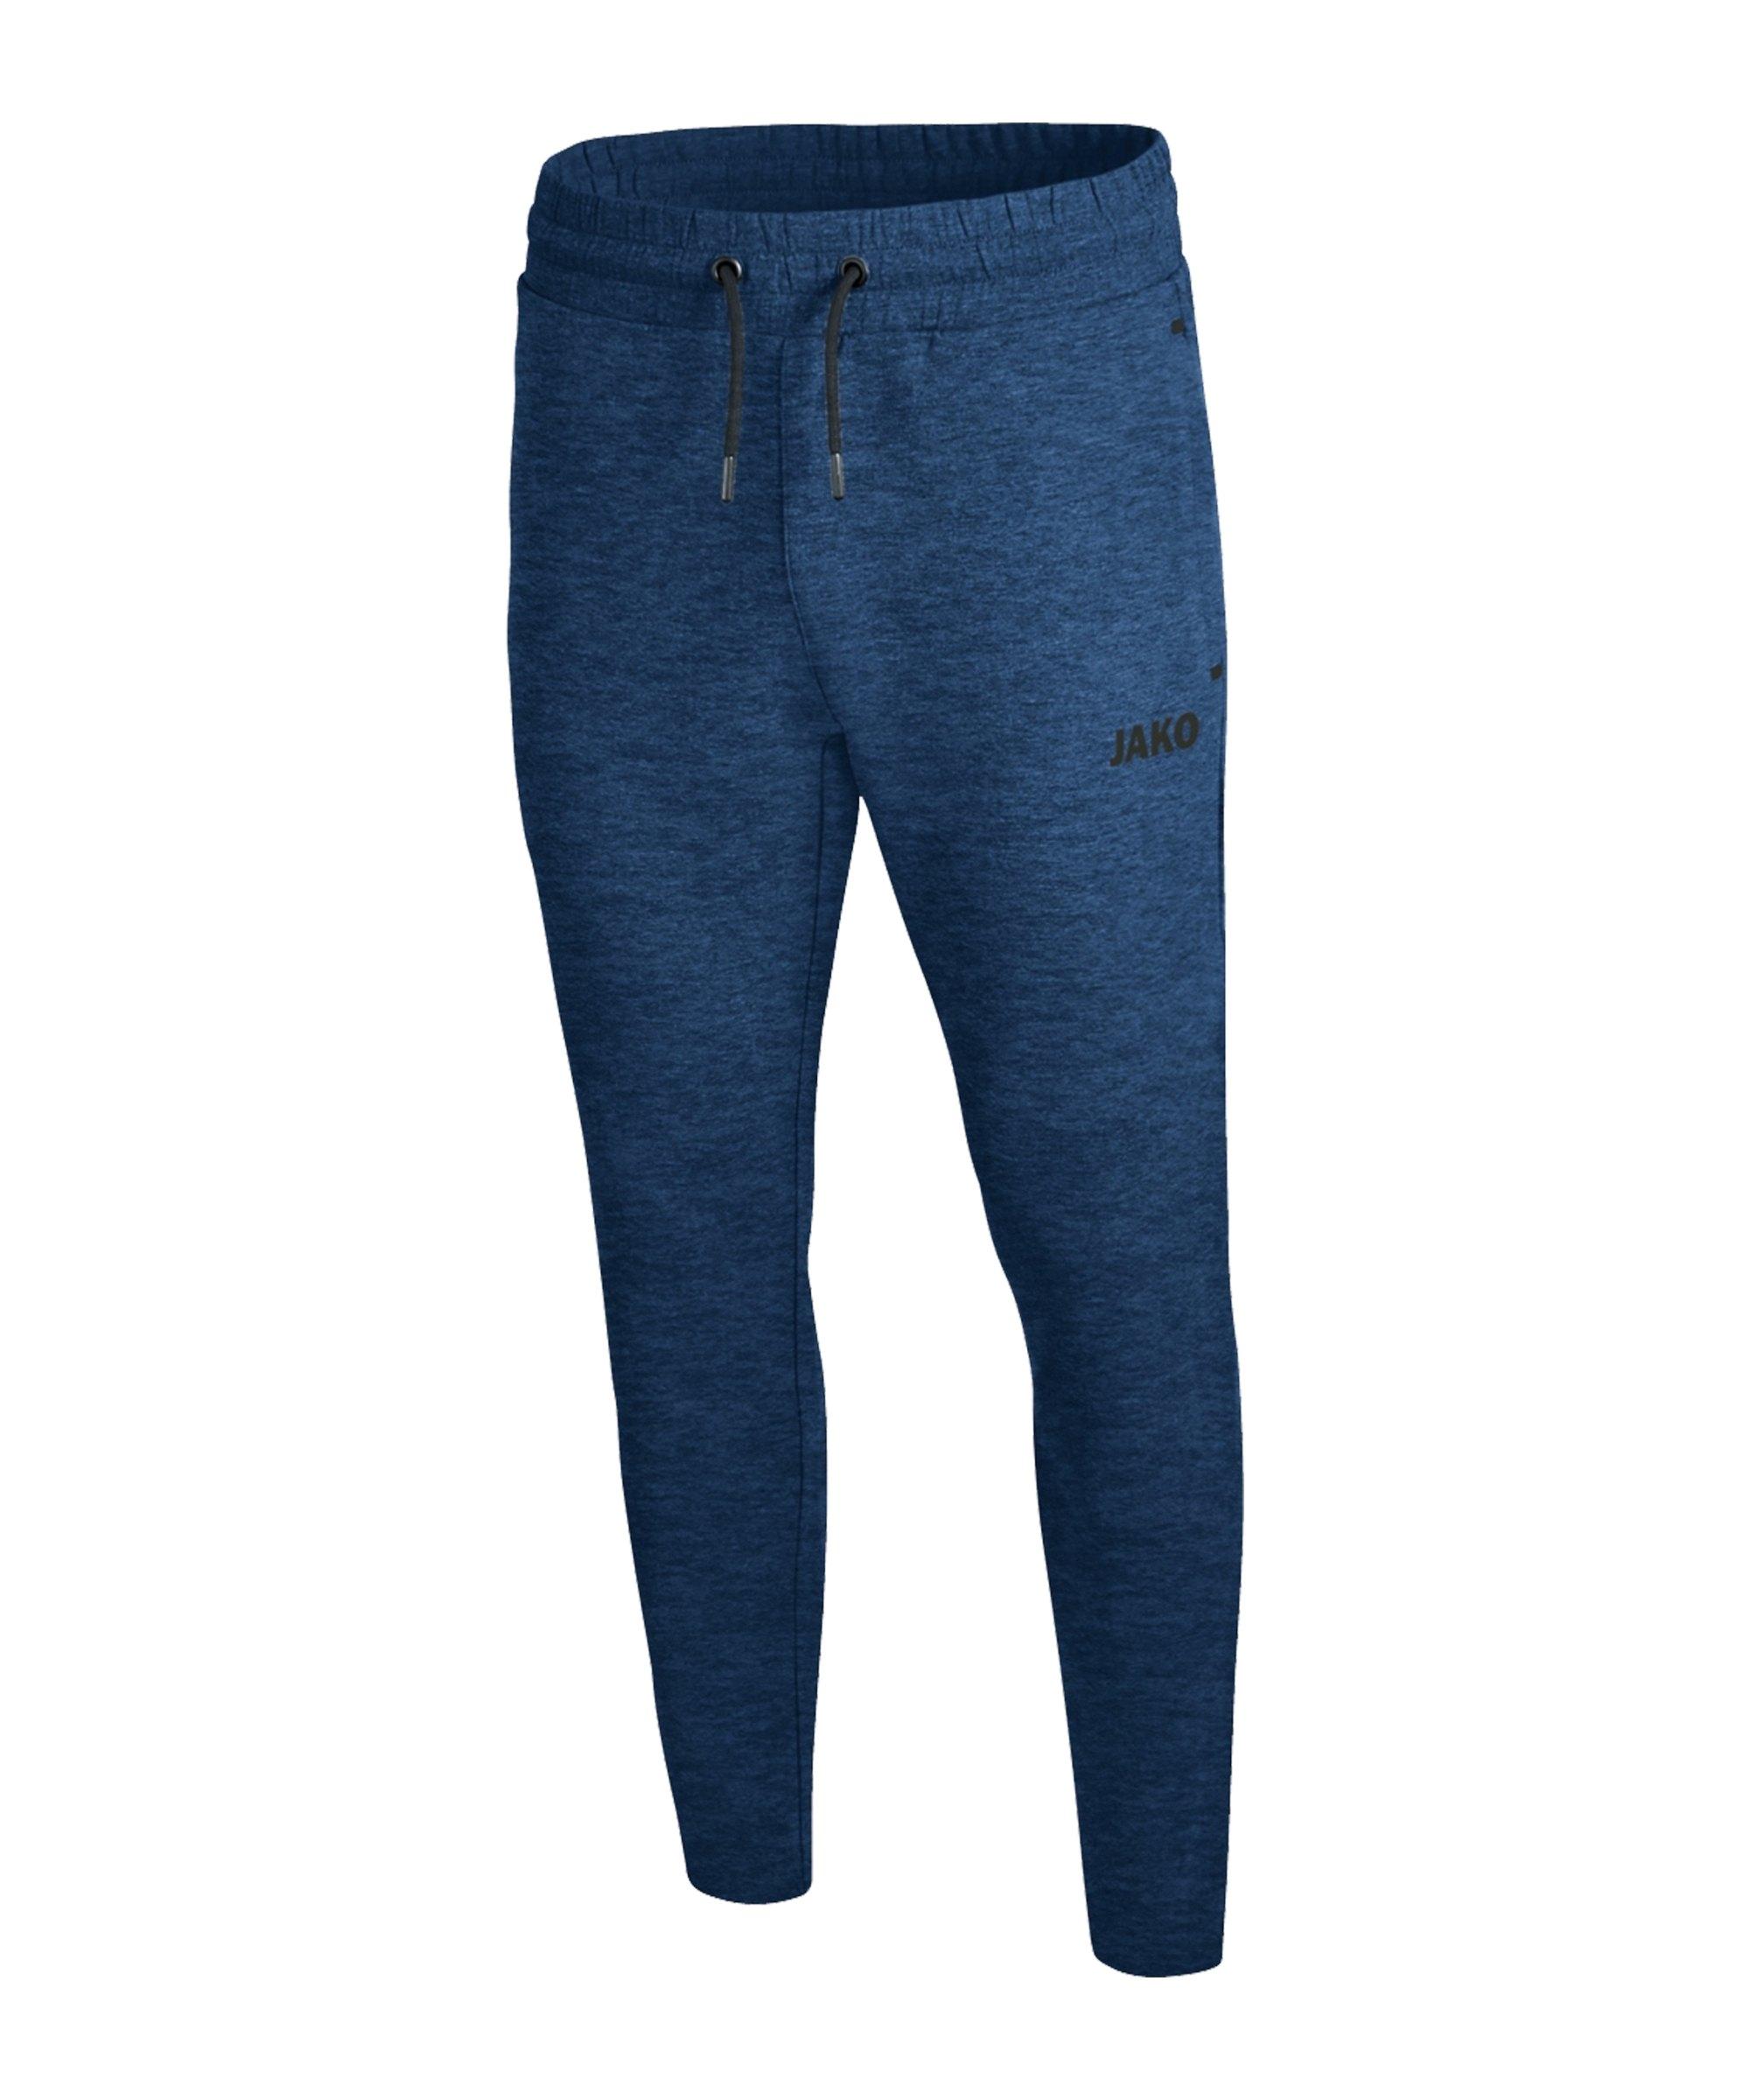 Jako Premium Basic Jogginghose Blau F49 - blau